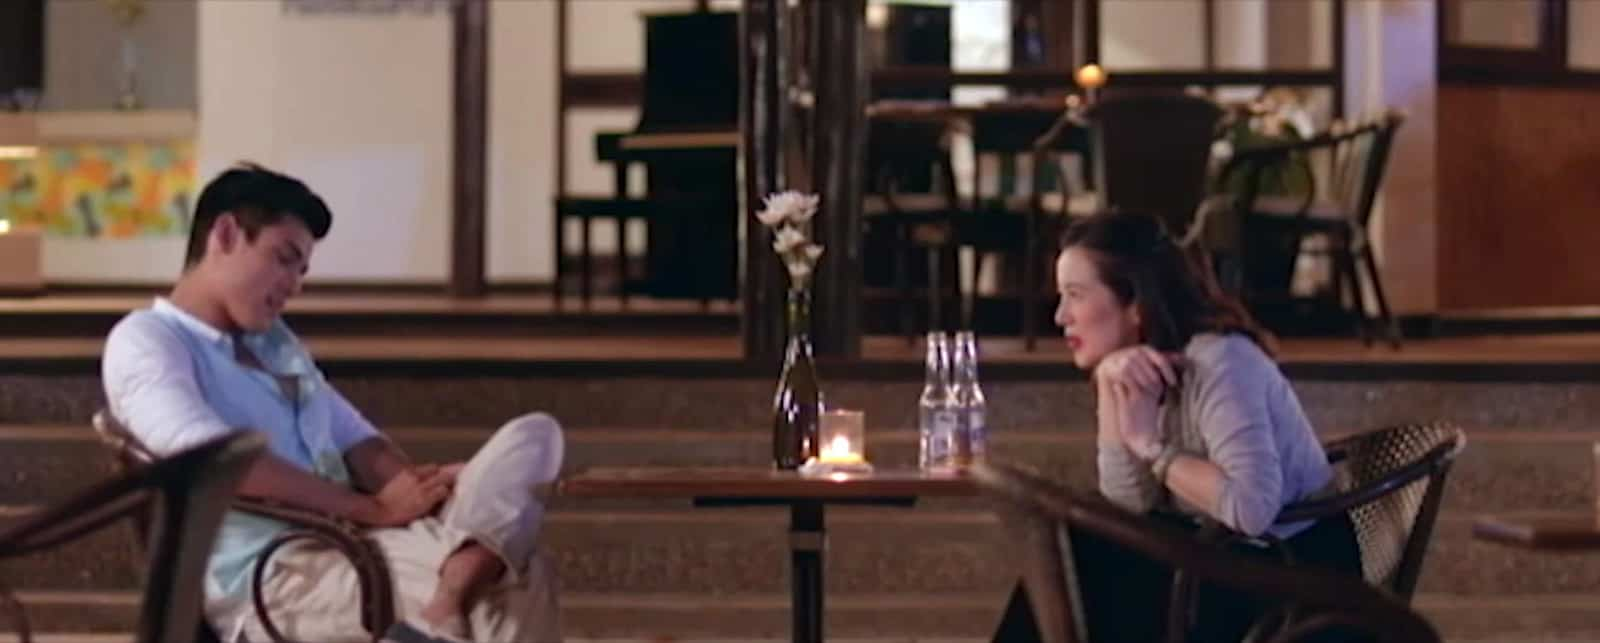 Xian Lim and Kris Aquino at Club Paradise Resort